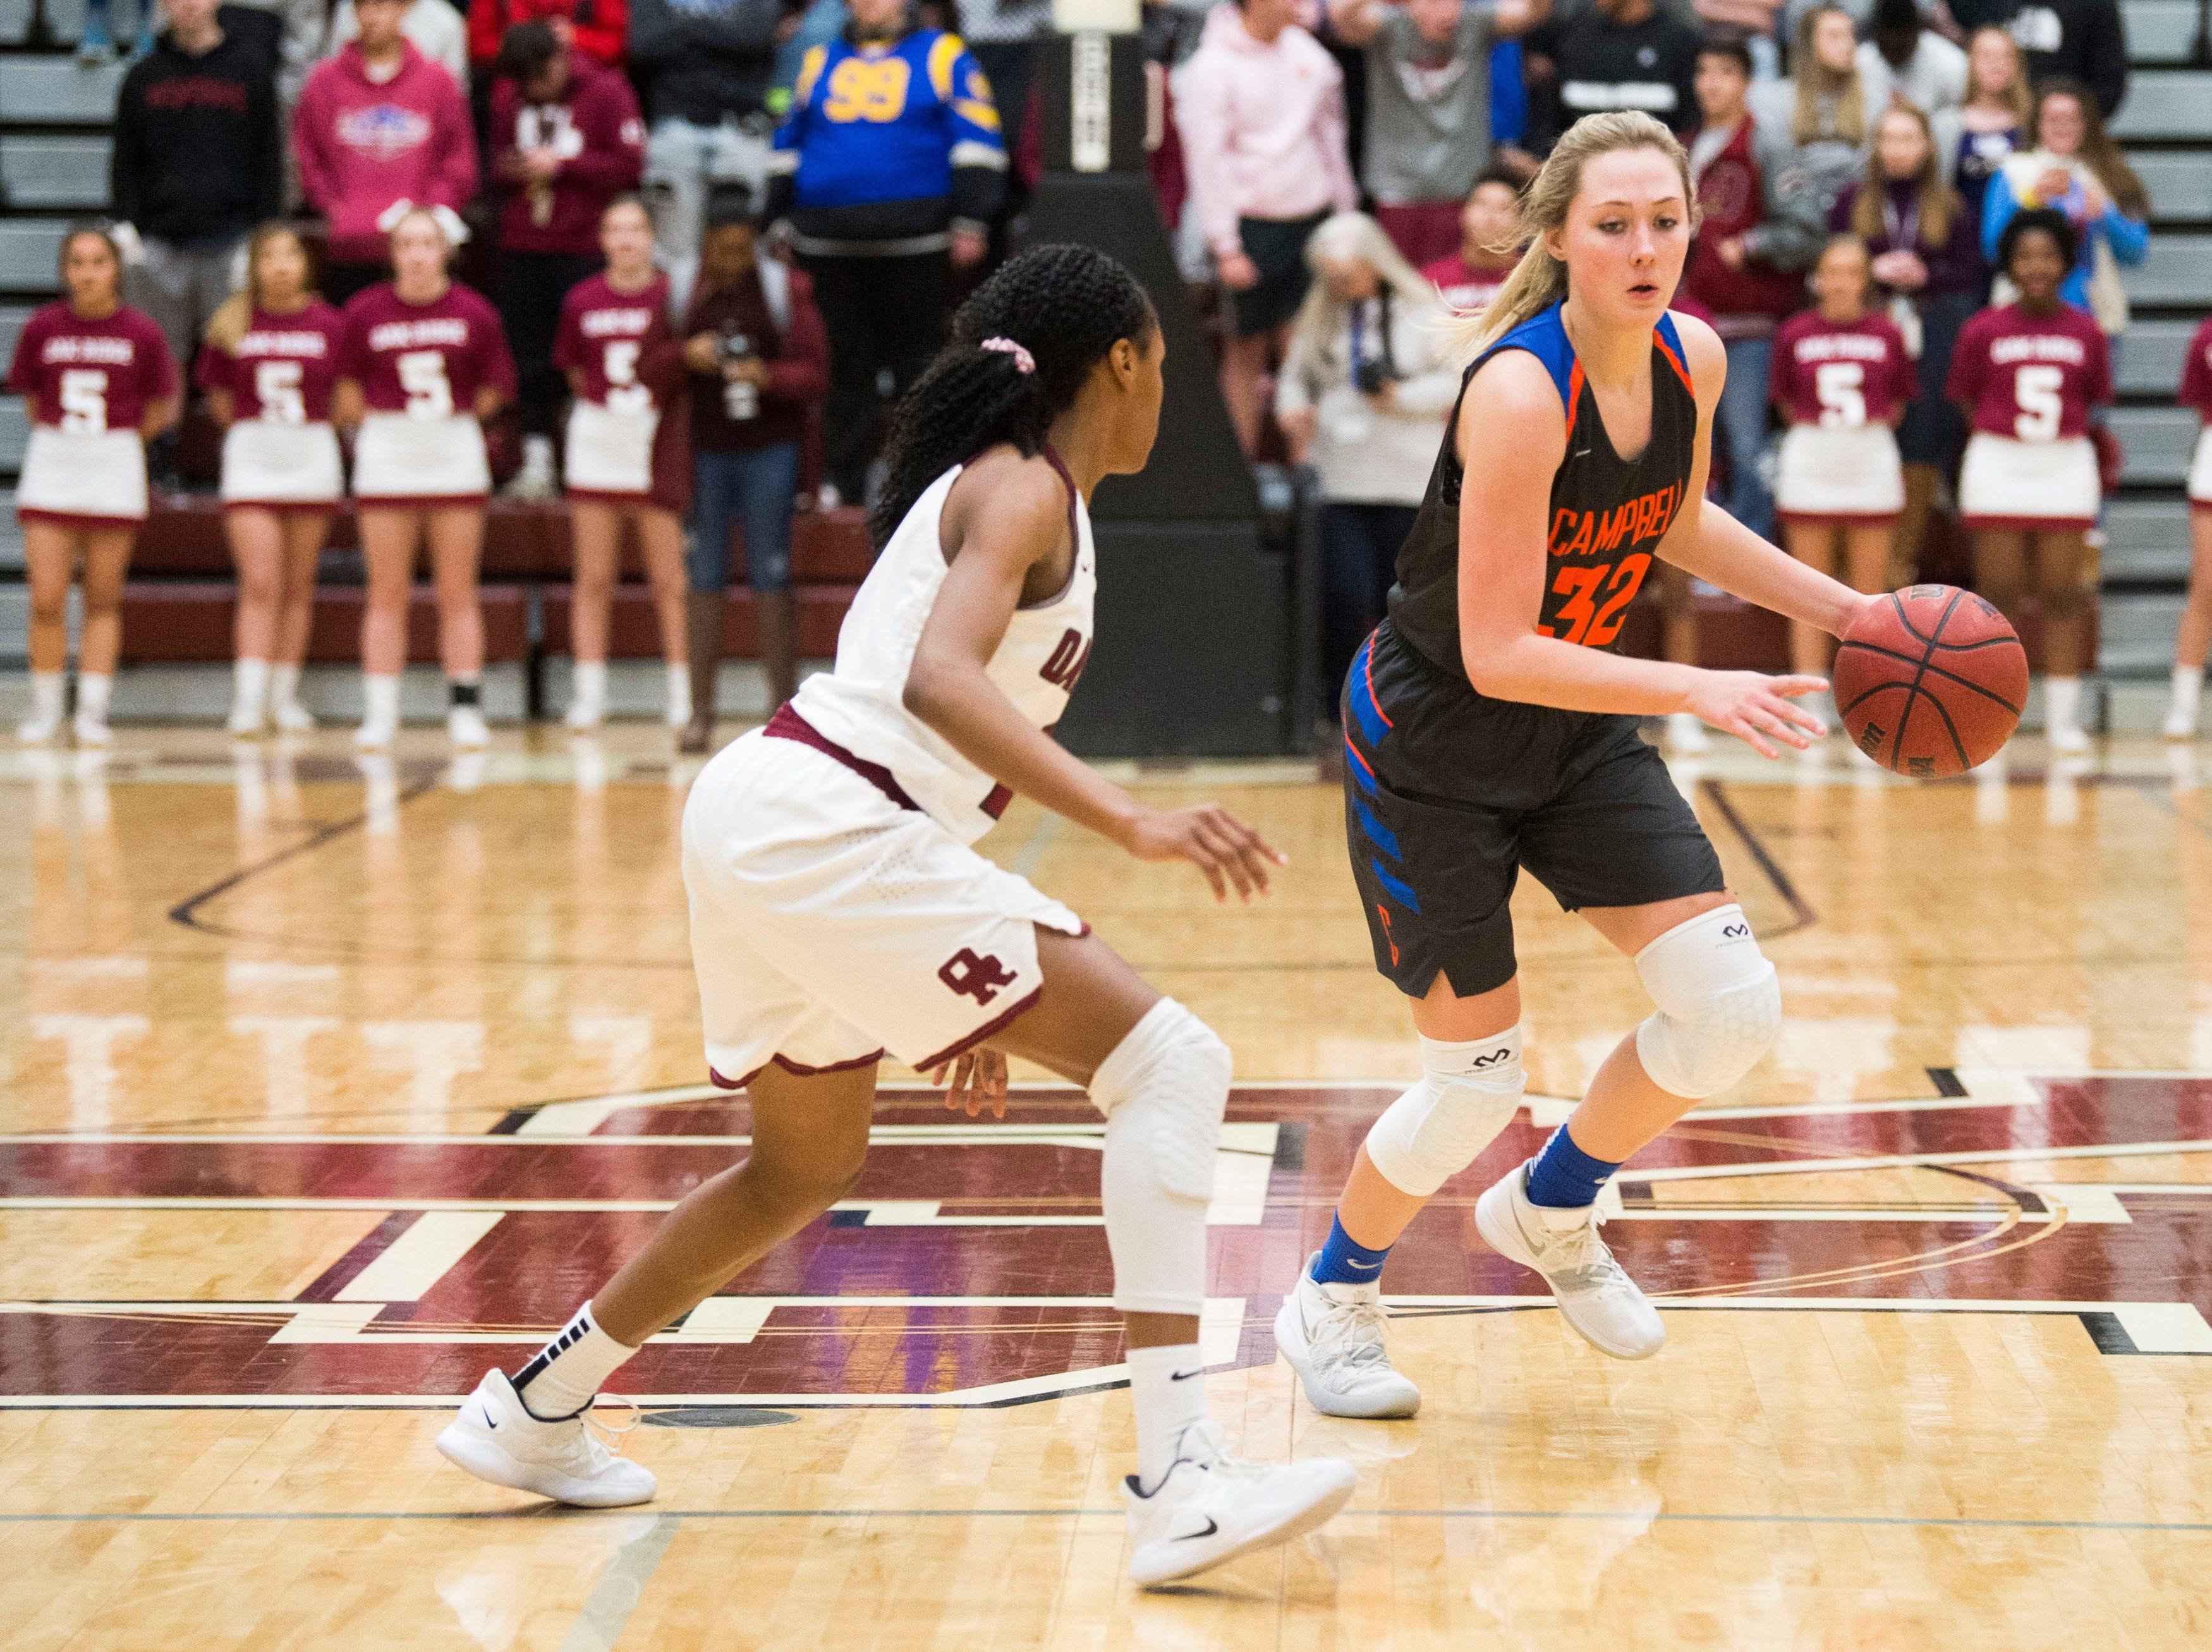 Campbell County's Skylar Boshears (32) runs the ball during a high school basketball game between Oak Ridge and Campbell County at Oak Ridge Friday, Feb. 1, 2019.